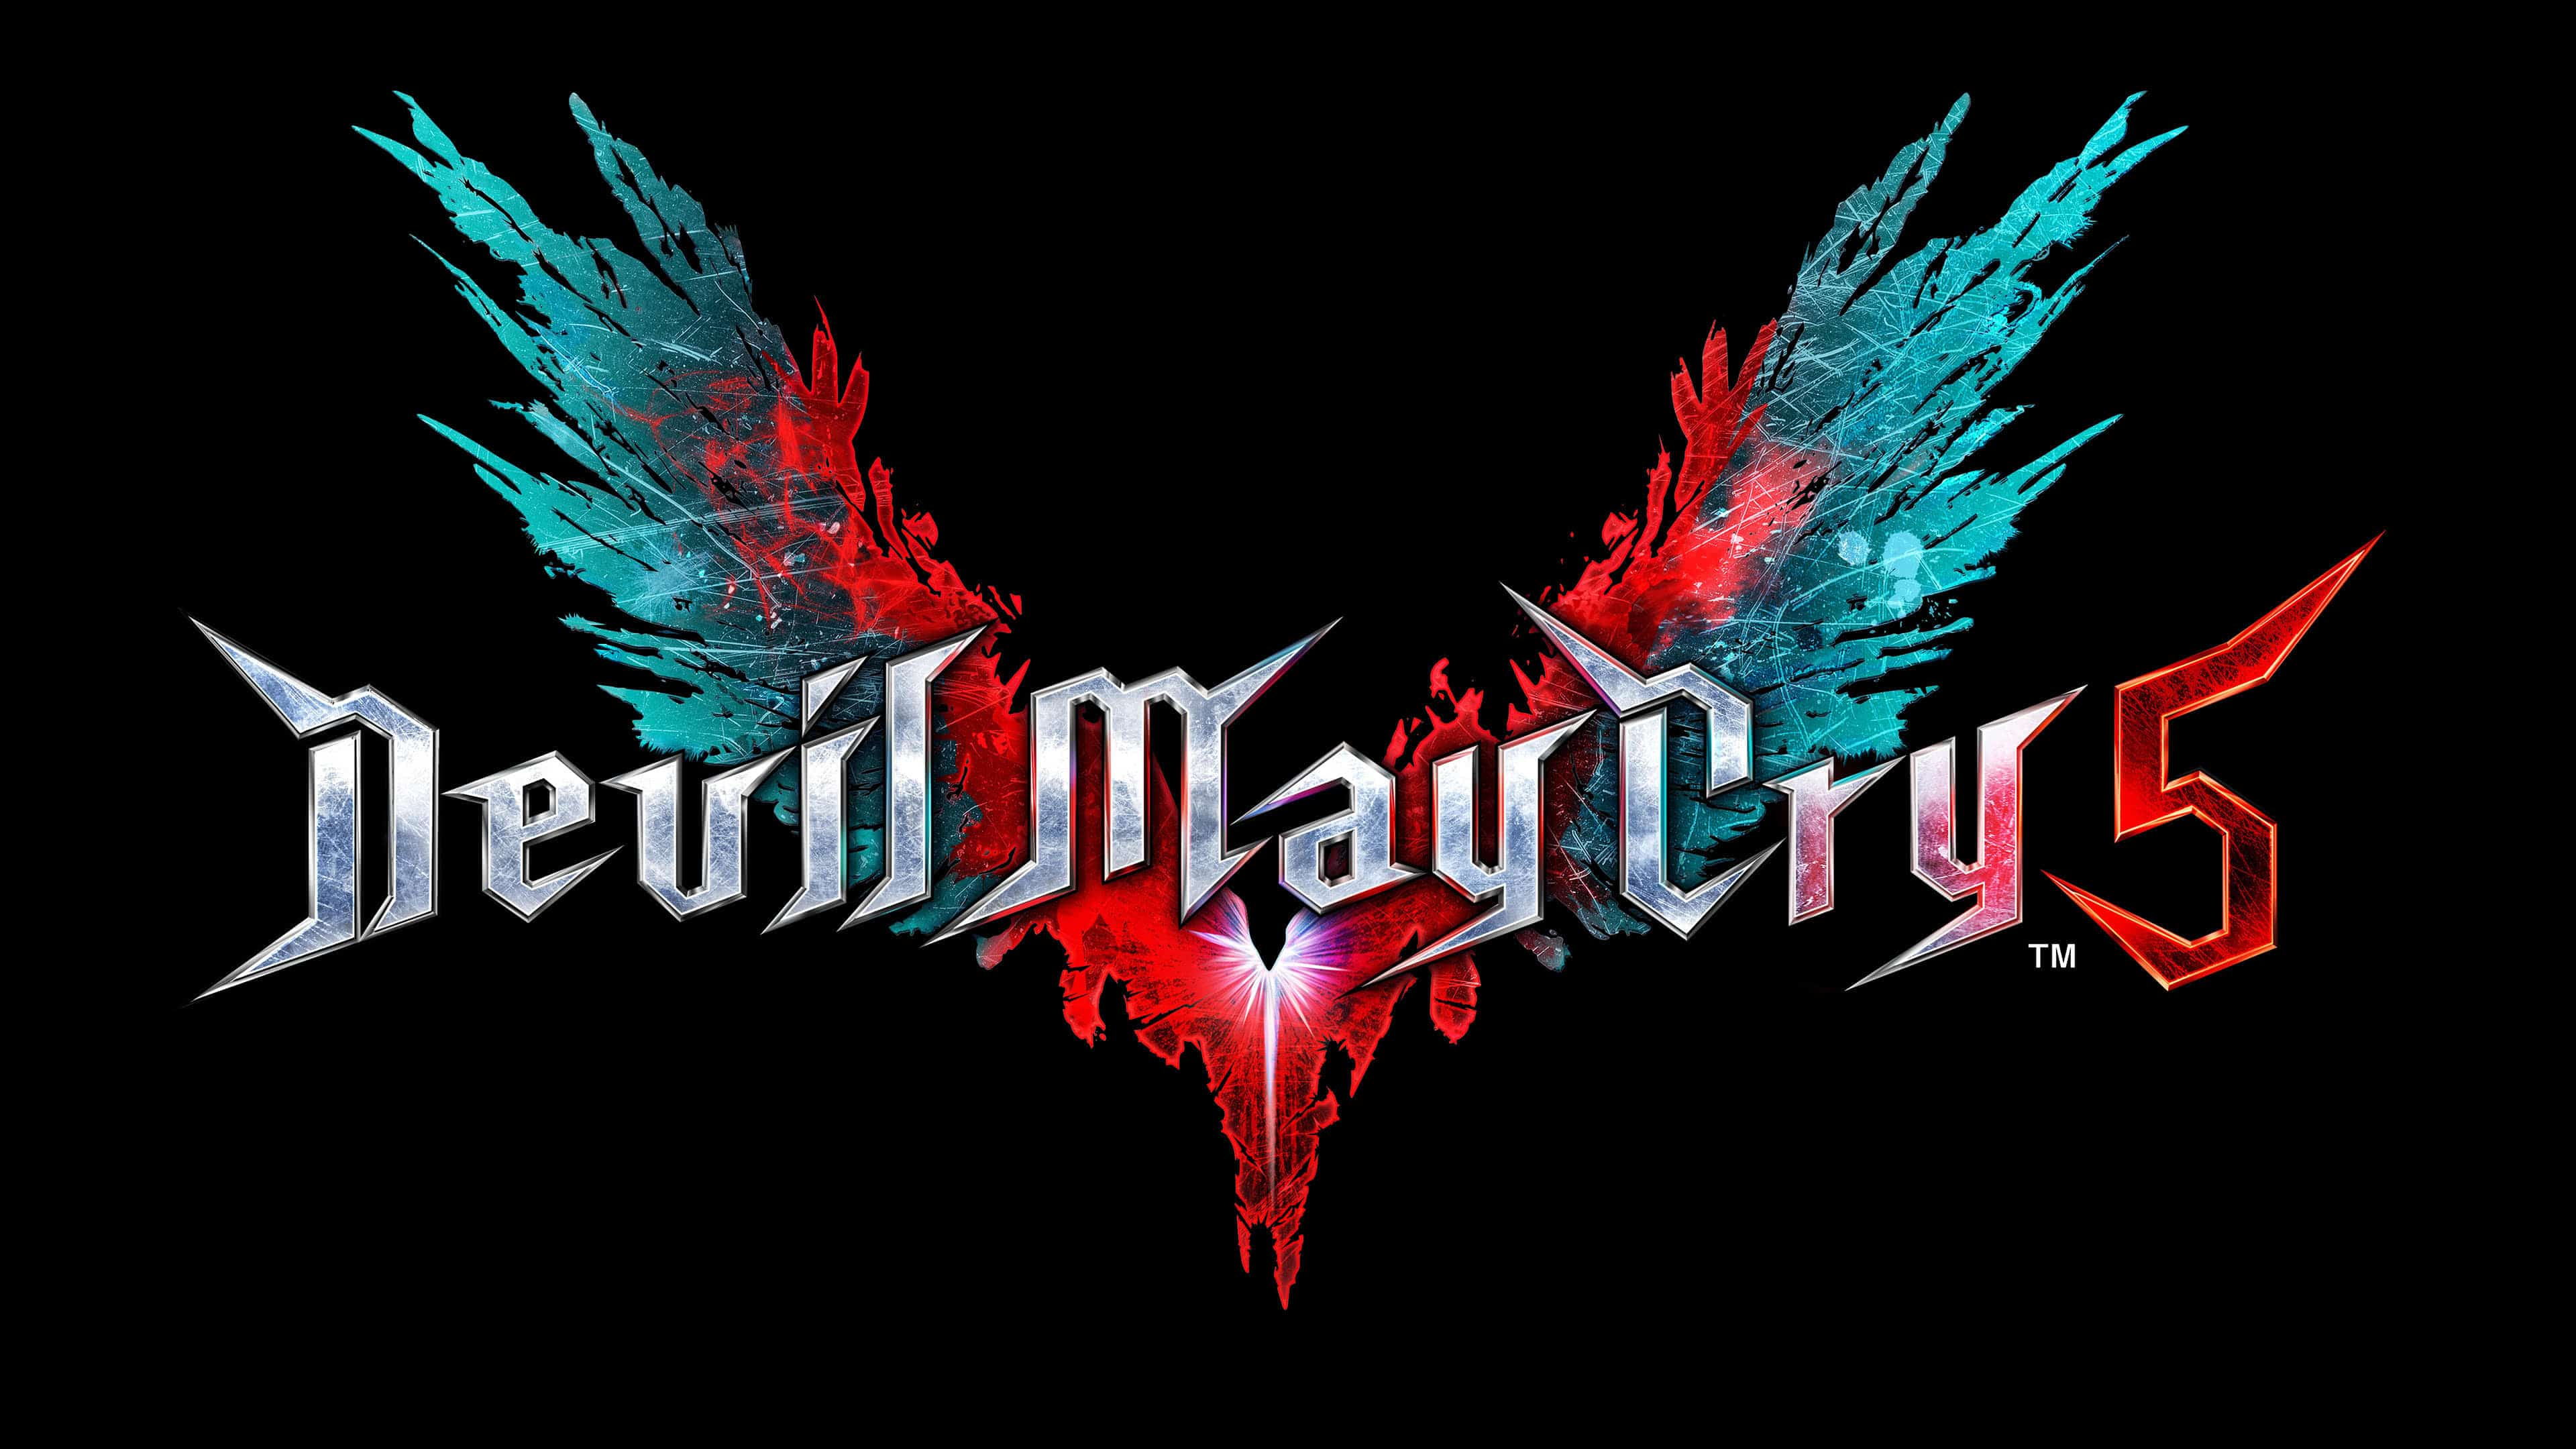 devil may cry 5 logo uhd 4k wallpaper